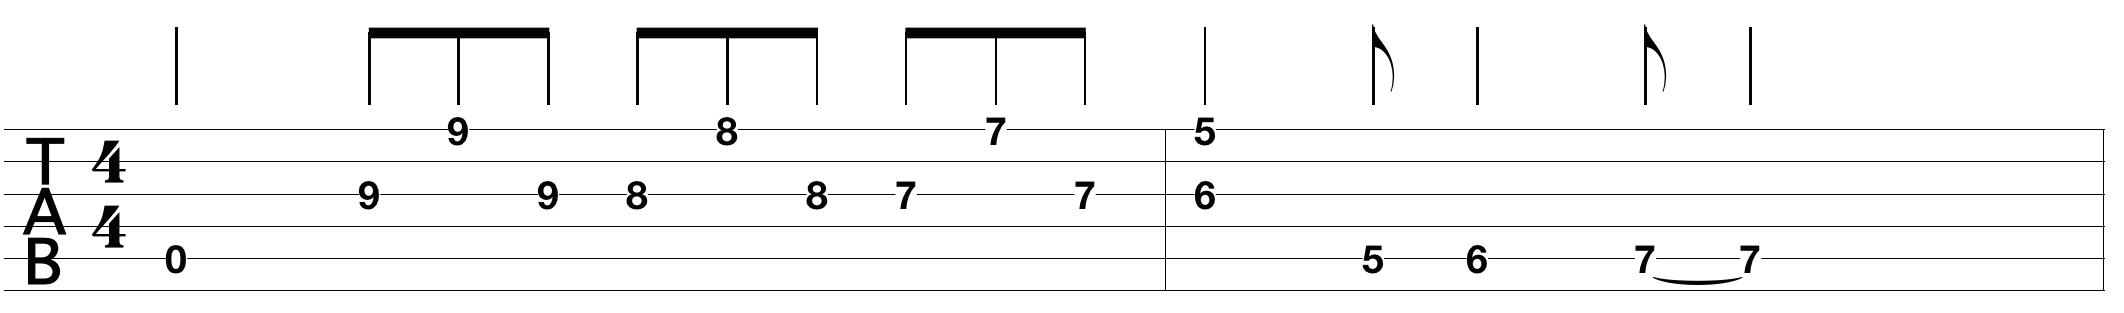 beginner-blues-guitar-lessons_1.png